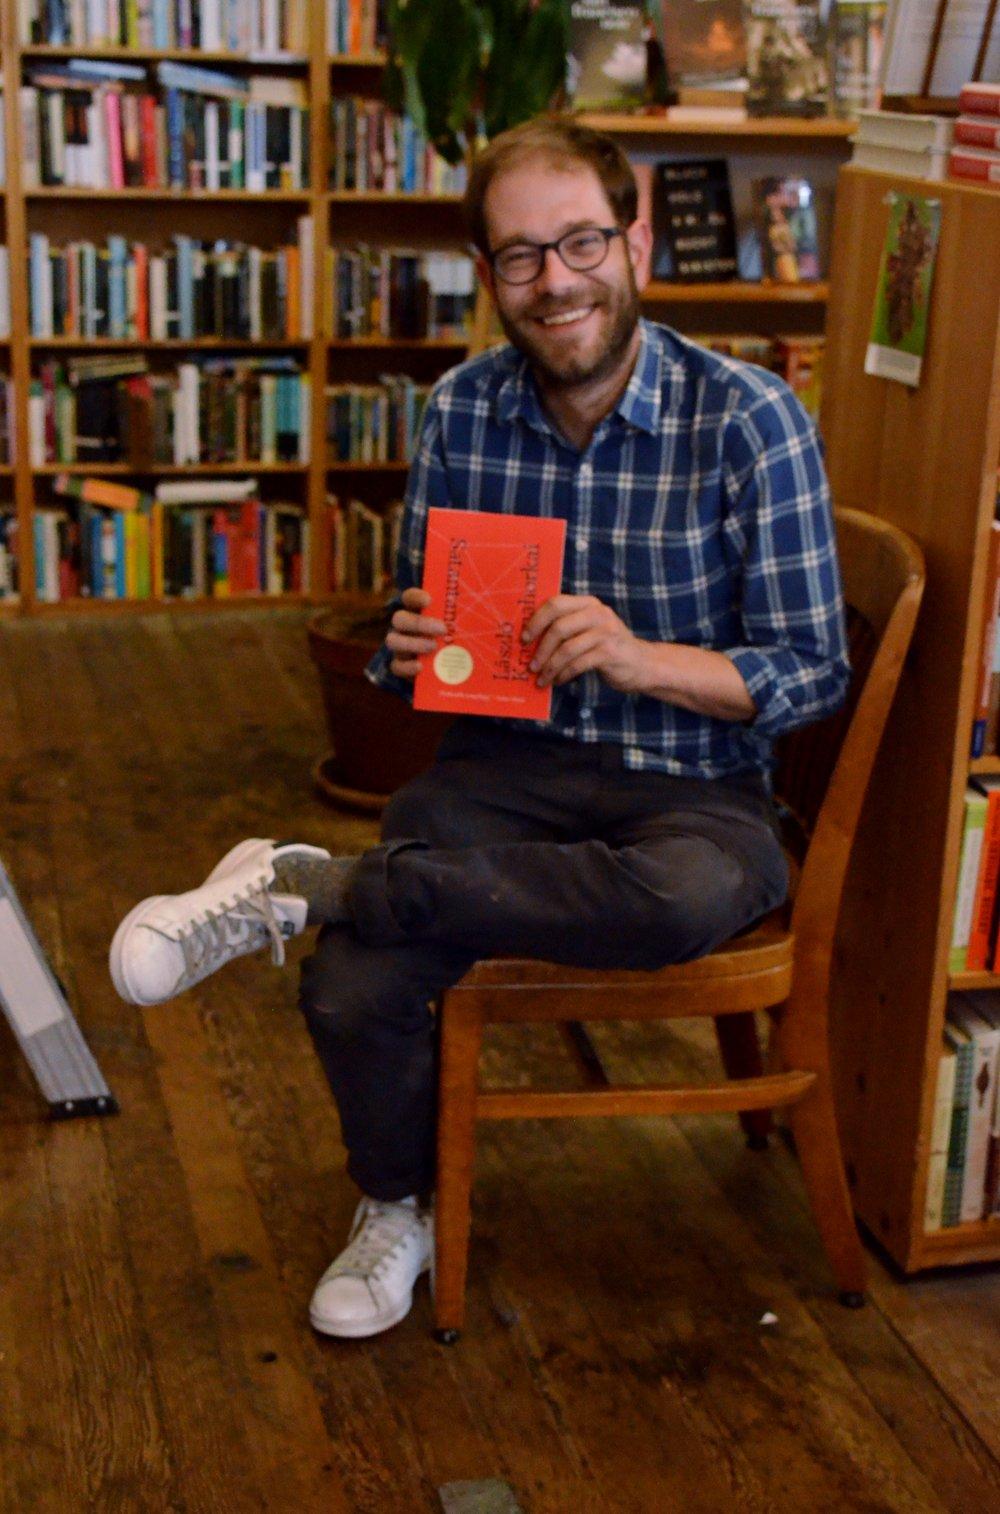 Ryan Smith of Valencia Dog Eared Books holding a current favorite novel, Satantango by Laszlo Krasznahorkai.